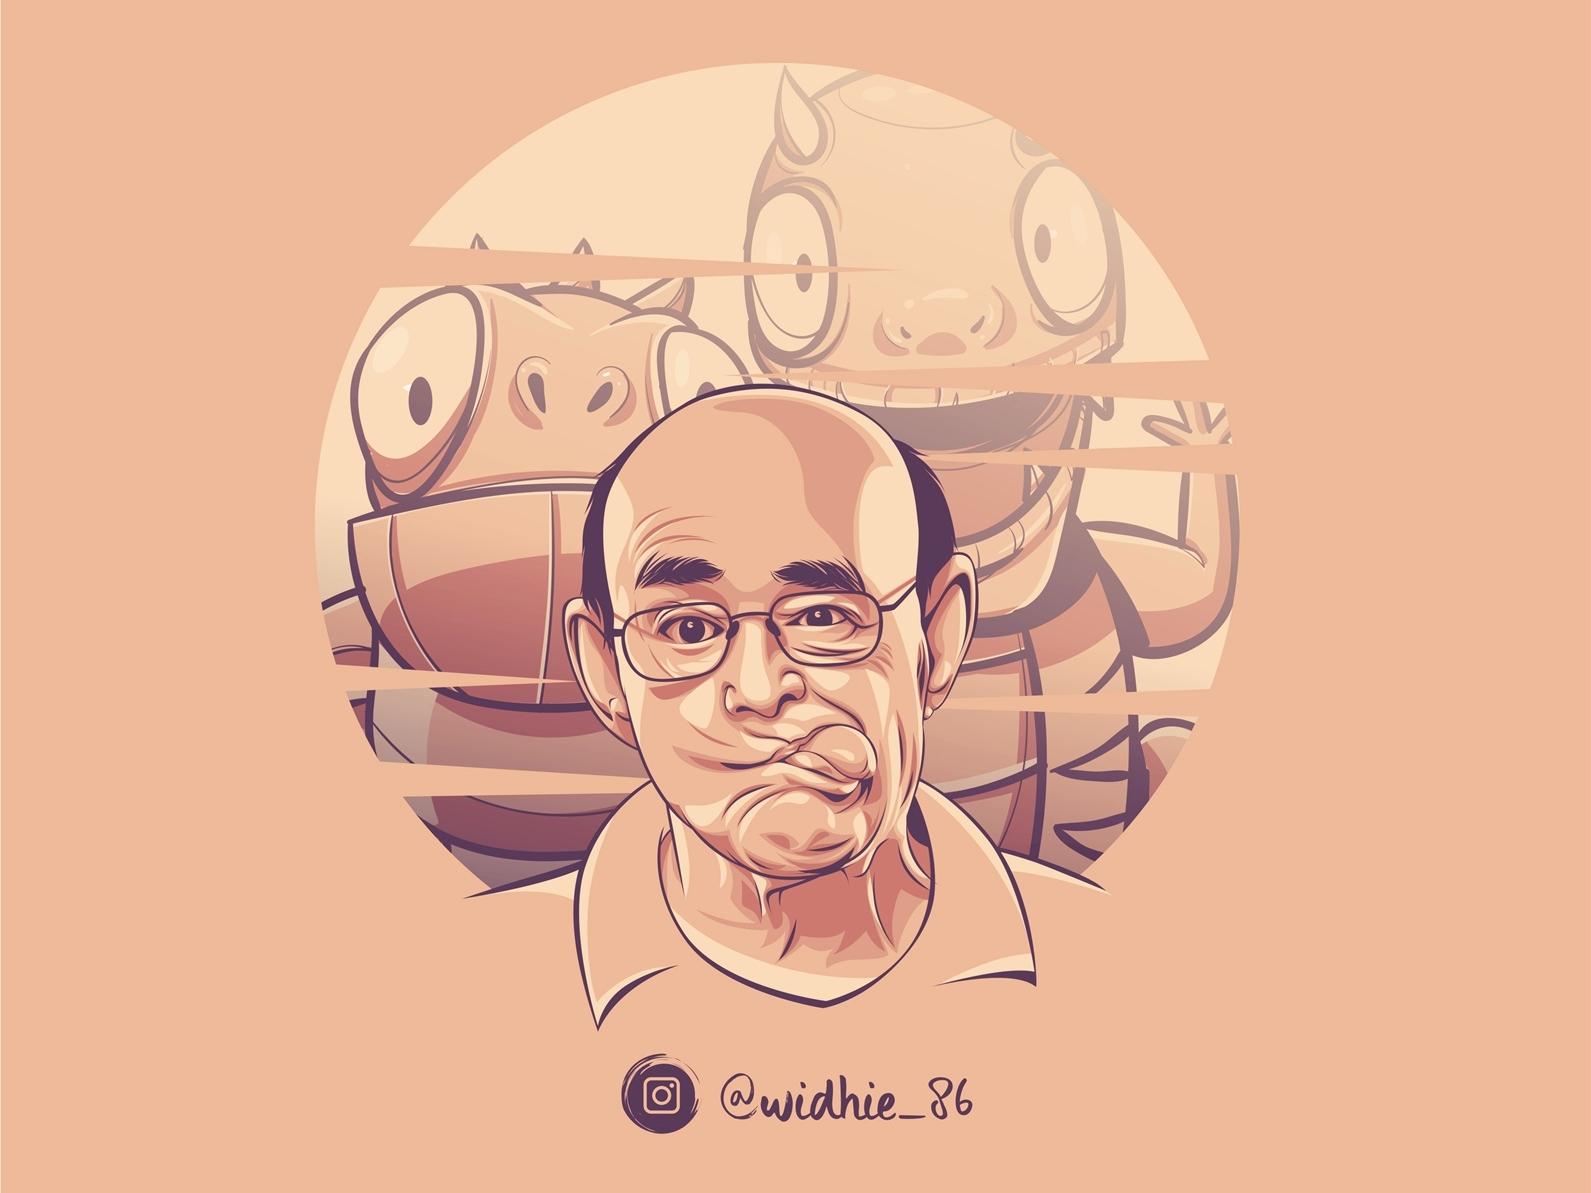 Bald design cartoon coreldraw indonesia illustration lineart portrait vector